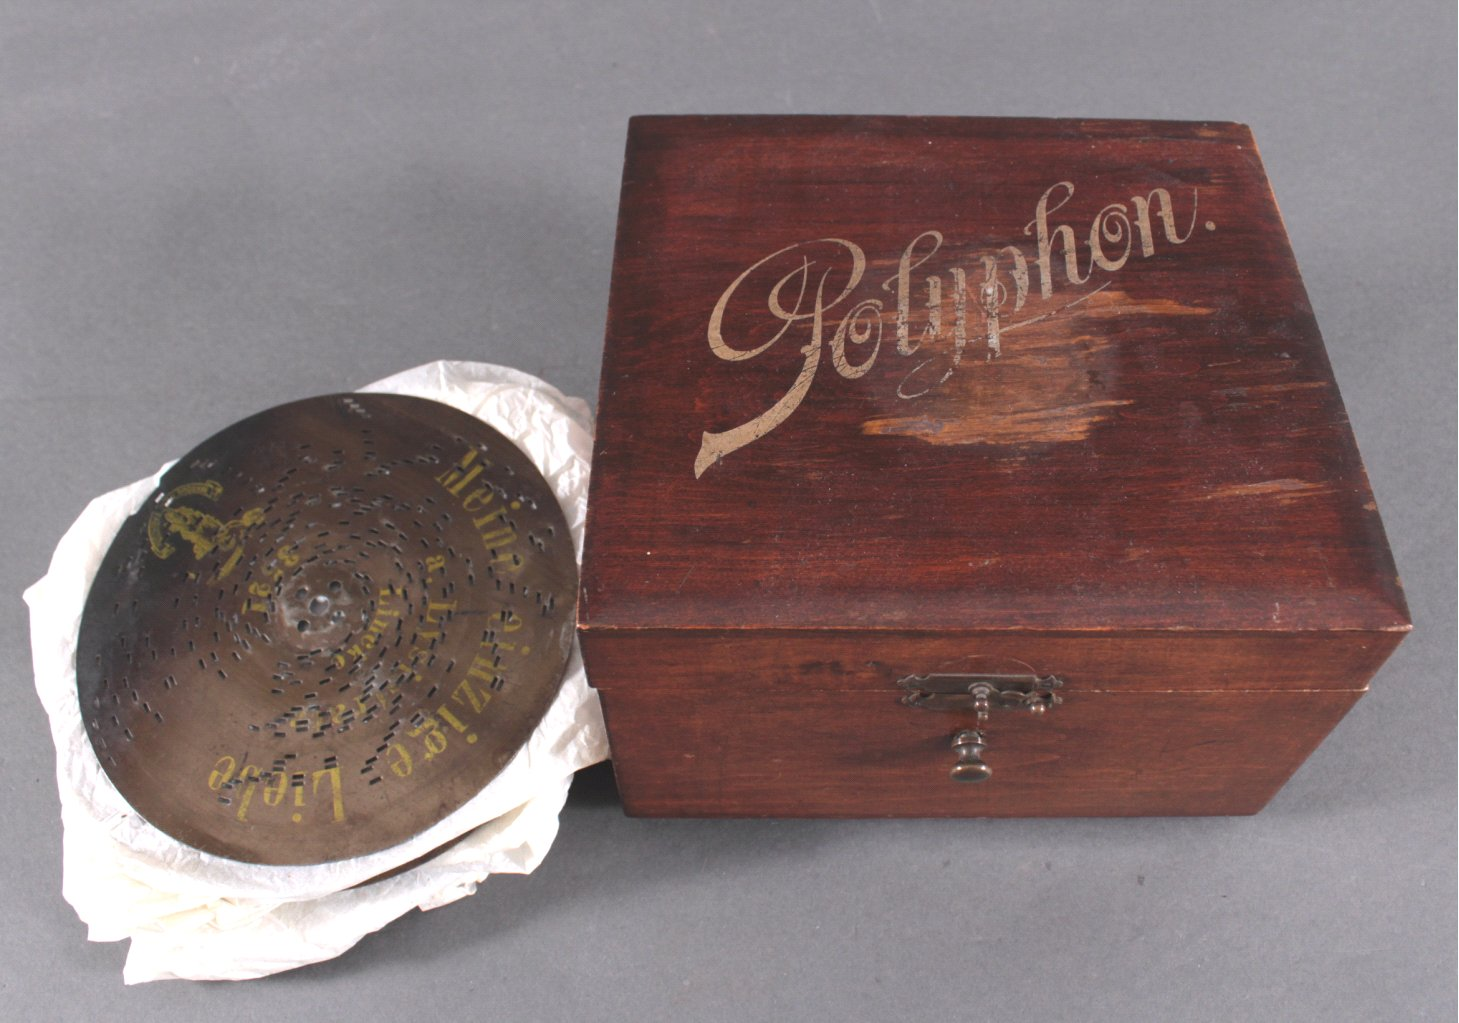 Polyphon, um 1900-2